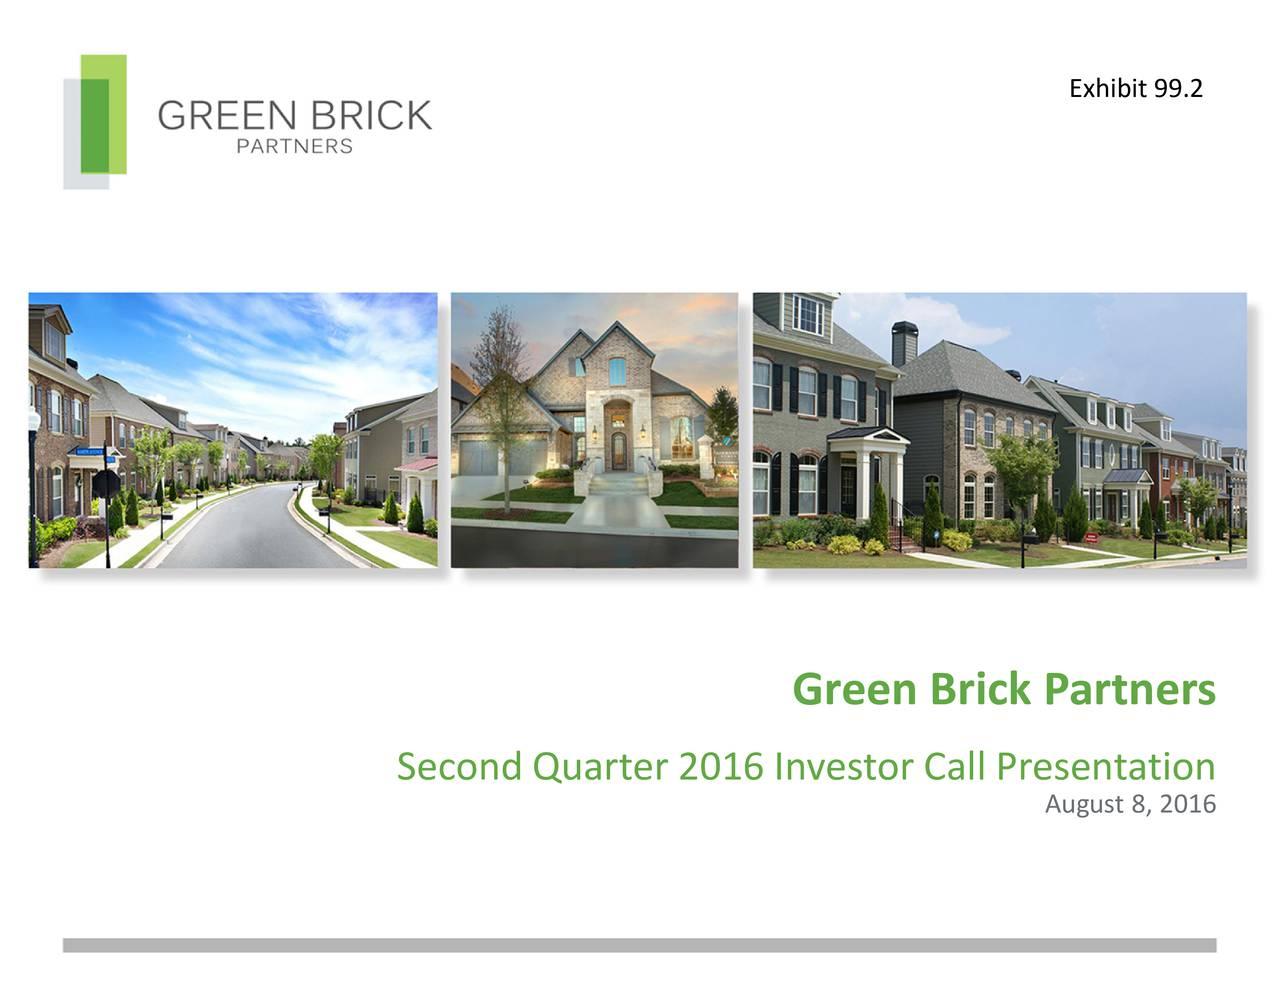 Green Brick Partners Second Quarter 2016 Investor Call Presentation August 8, 2016